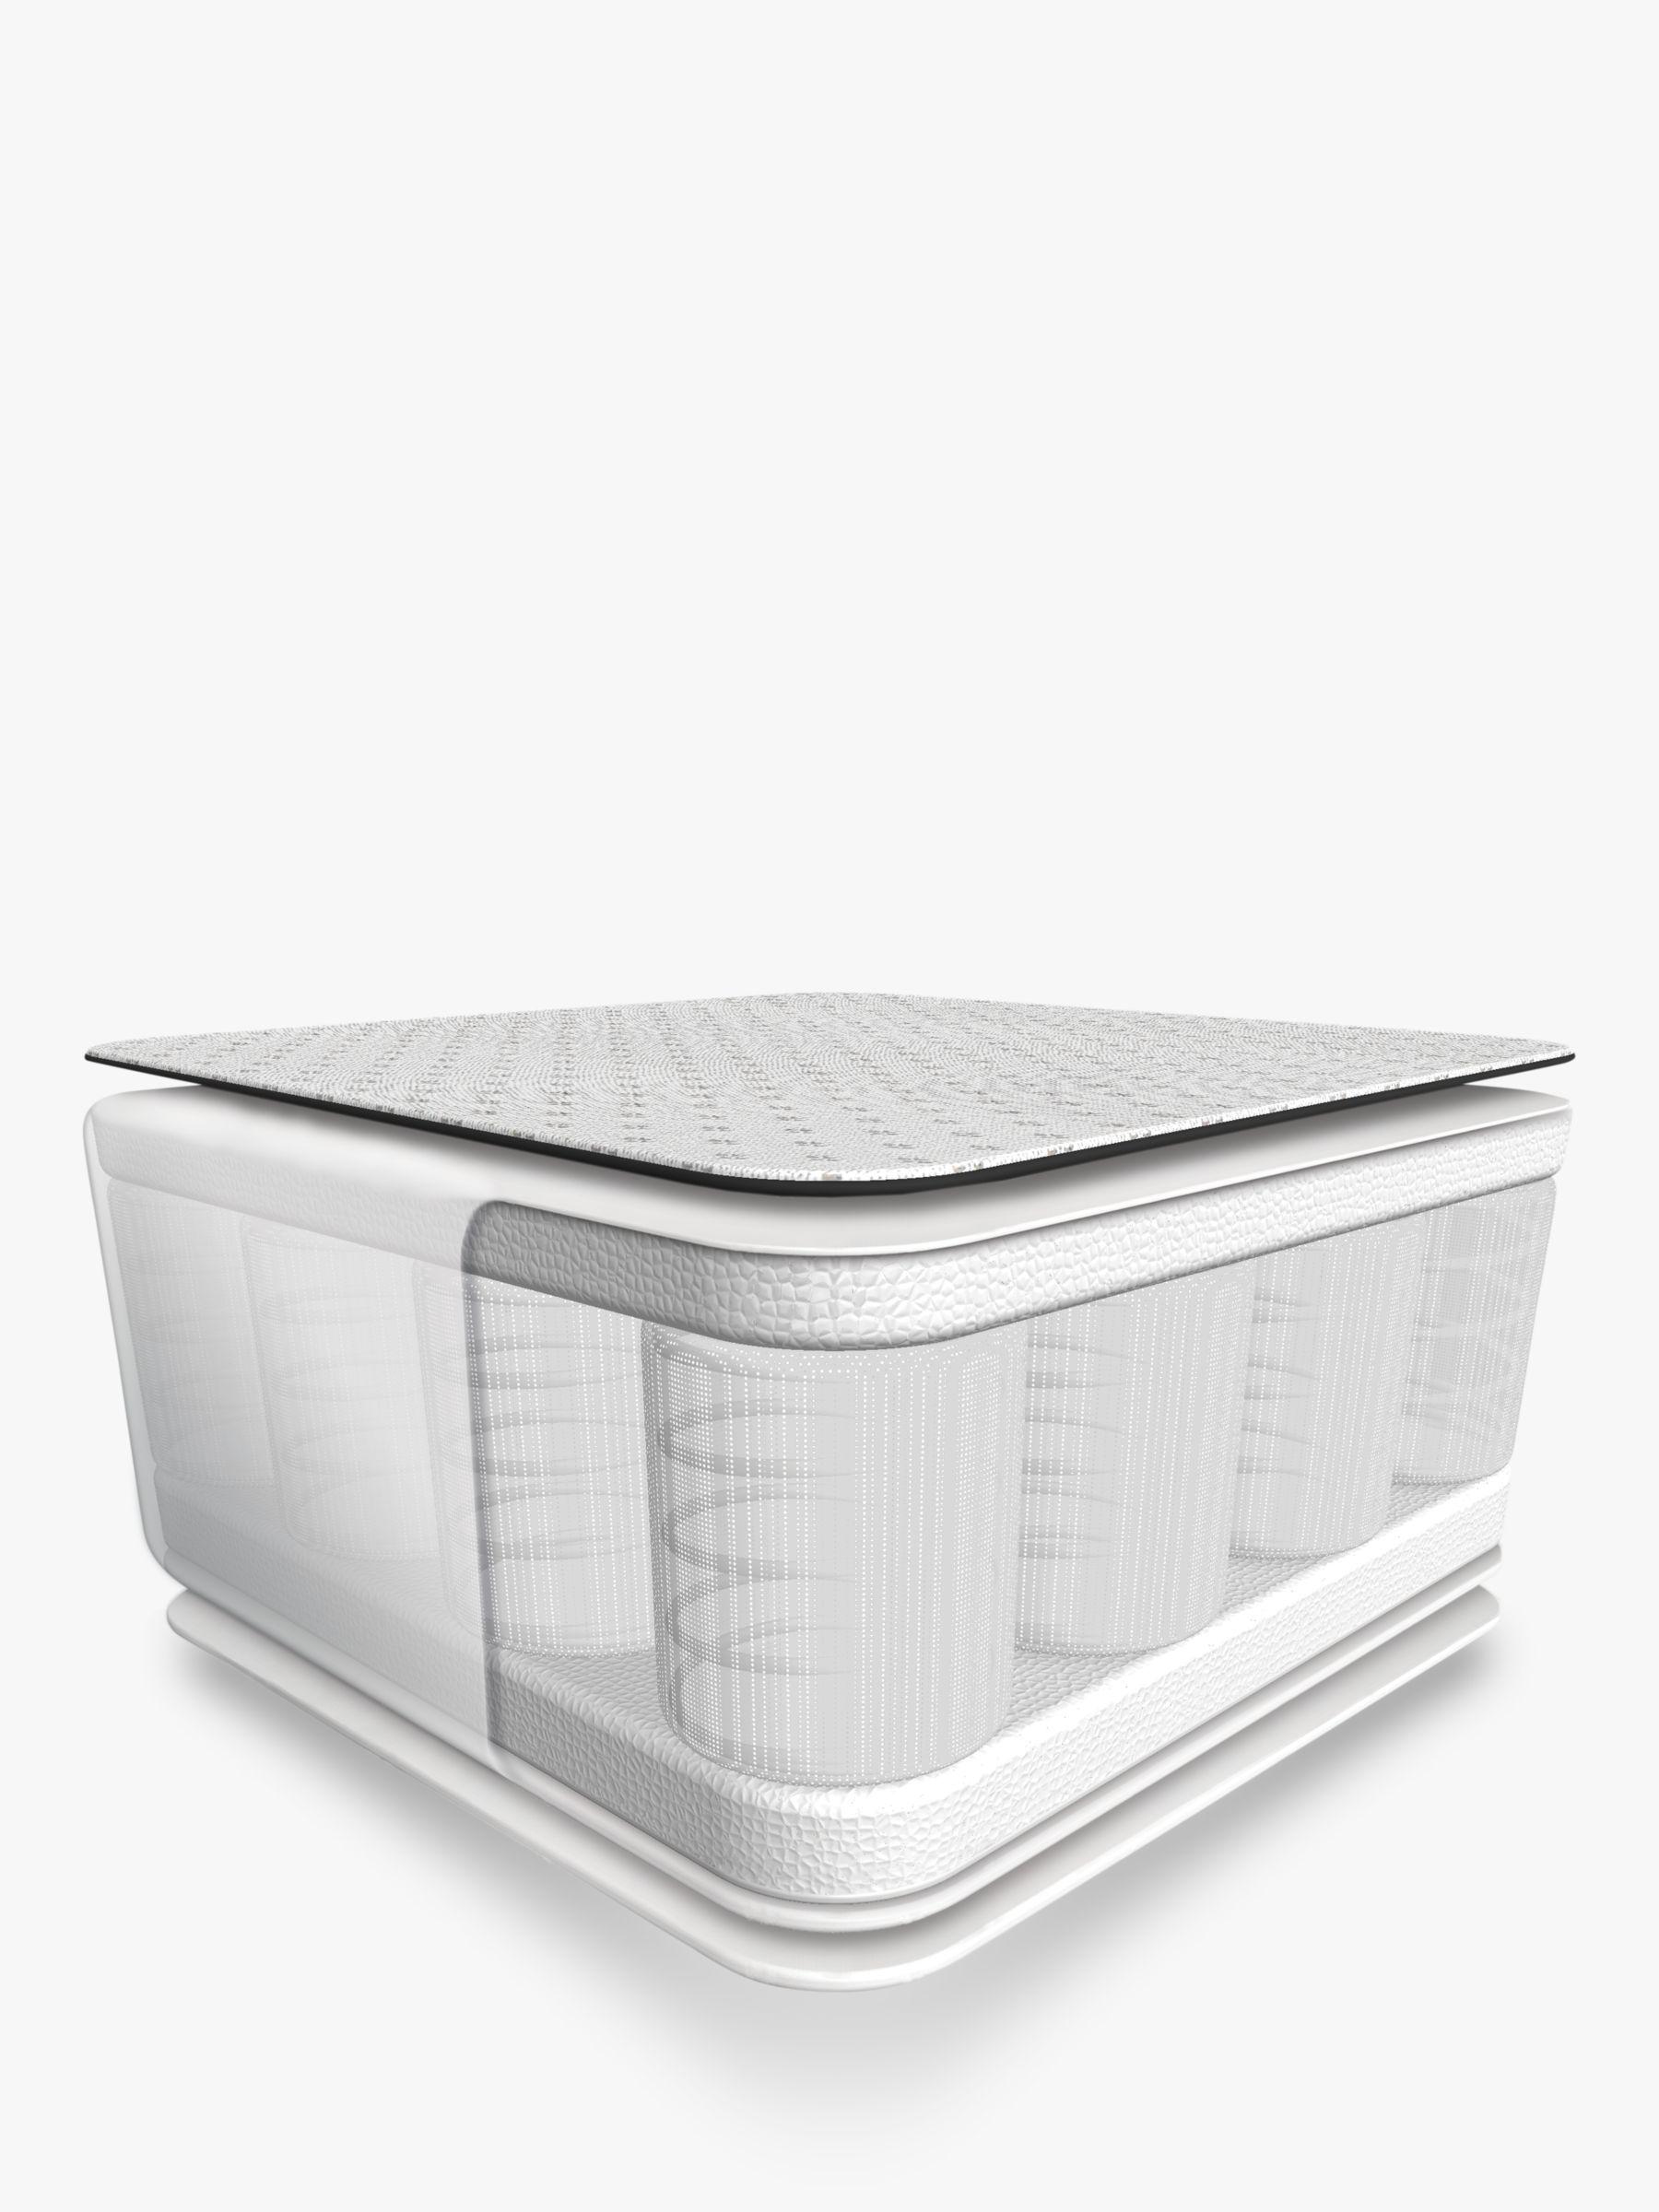 John Lewis & Partners Pocket Spring Cot Mattress, 120 x